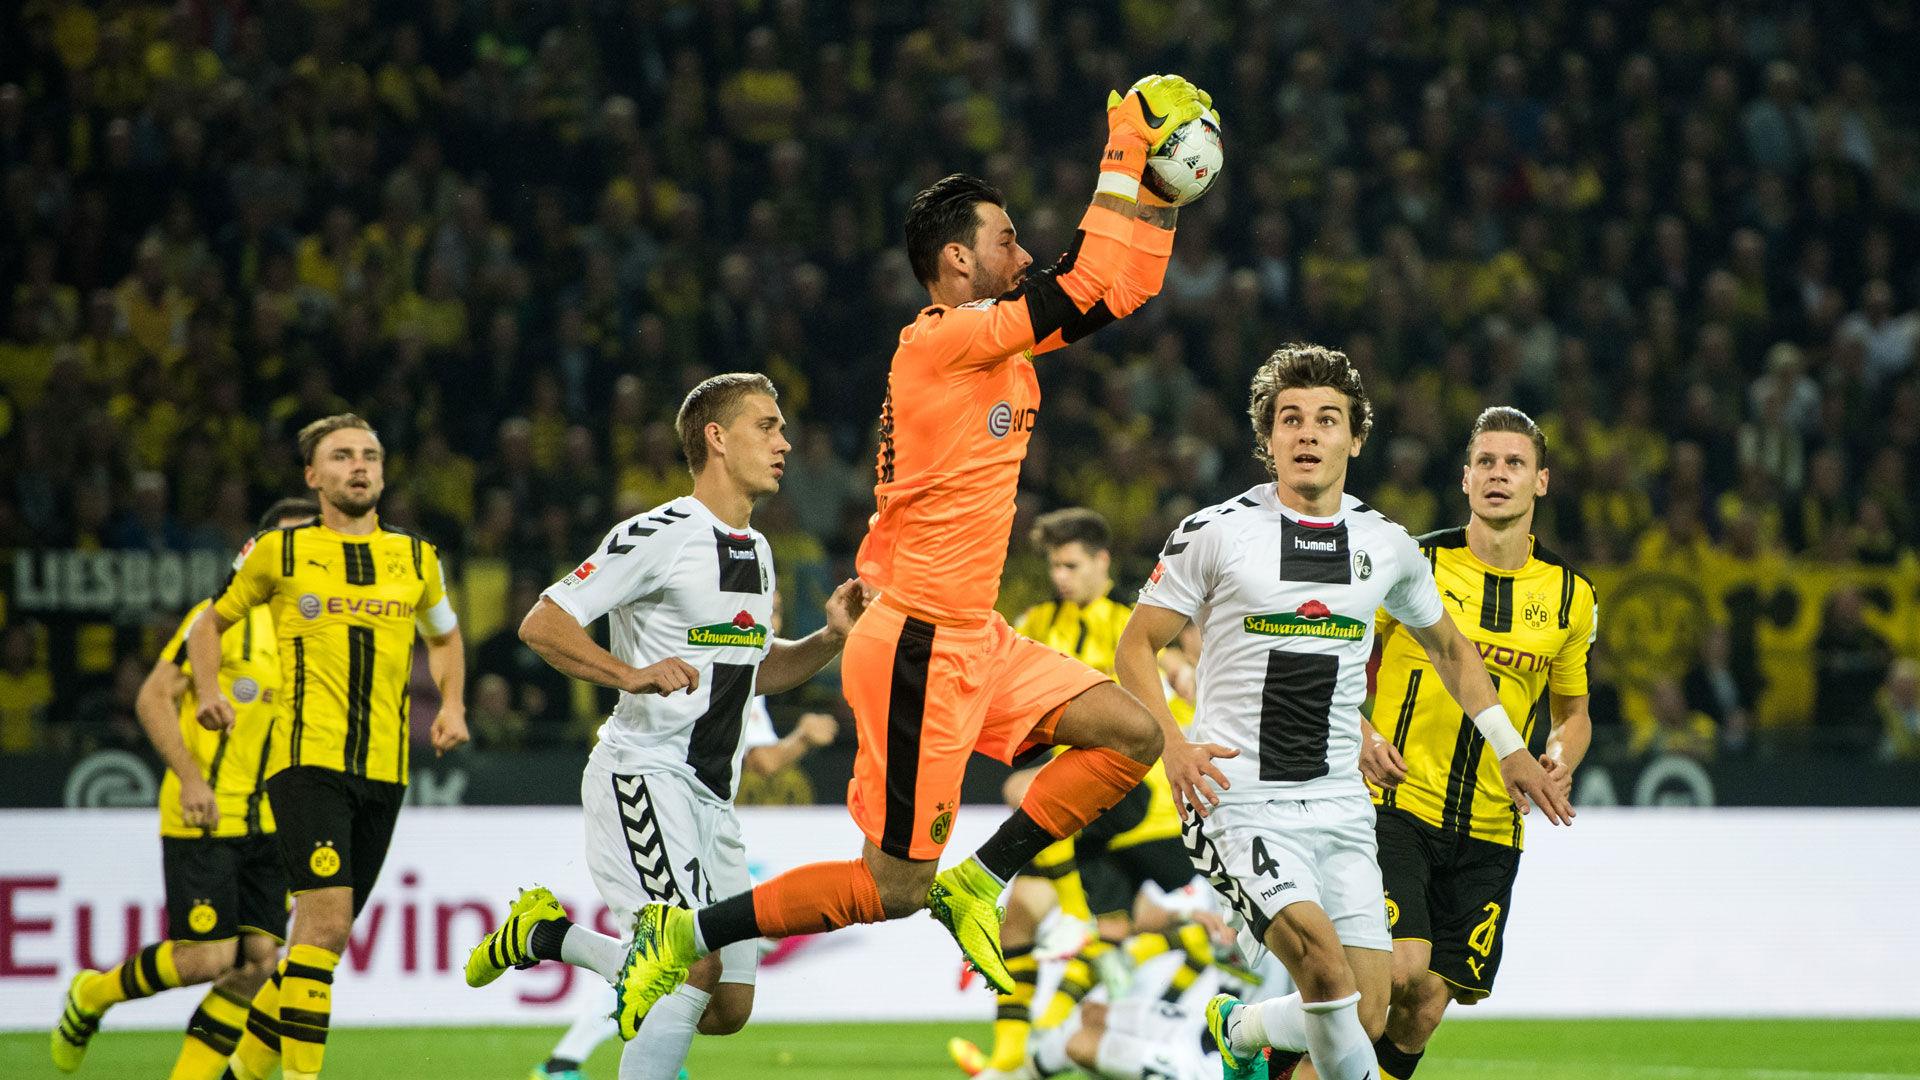 Hasil gambar untuk Freiburg vs Borussia Dortmund